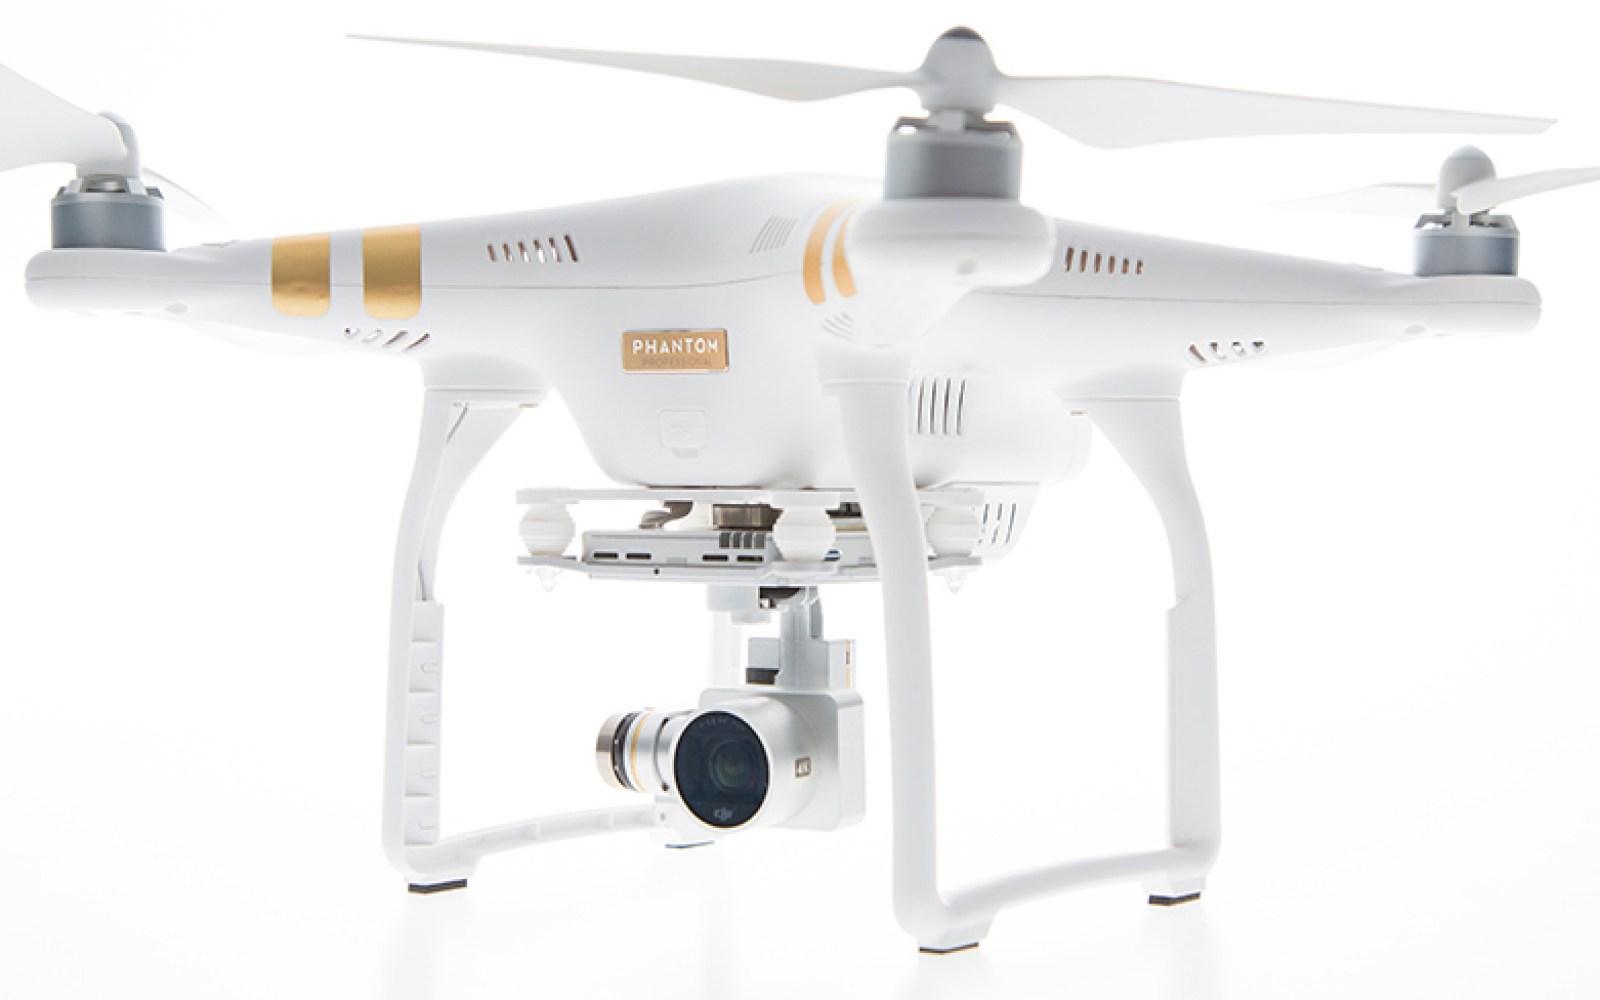 DJI's Phantom 3 drone shoots 4K video, uses new sensors to navigate indoor airspace